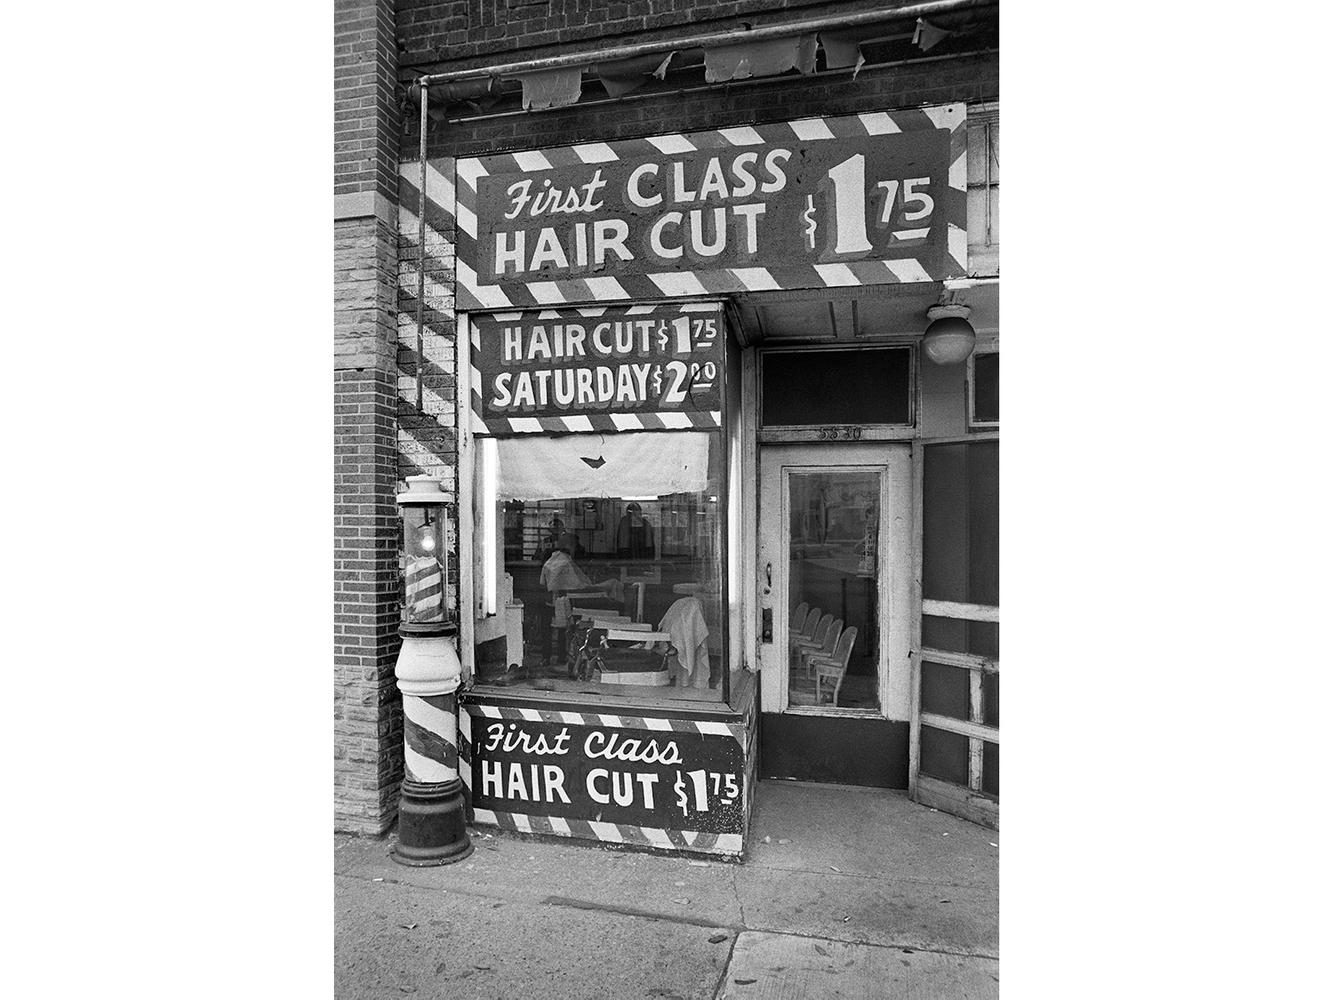 First Class Haircut Barber Shop, 5530 Michigan Ave., Detroit 1972